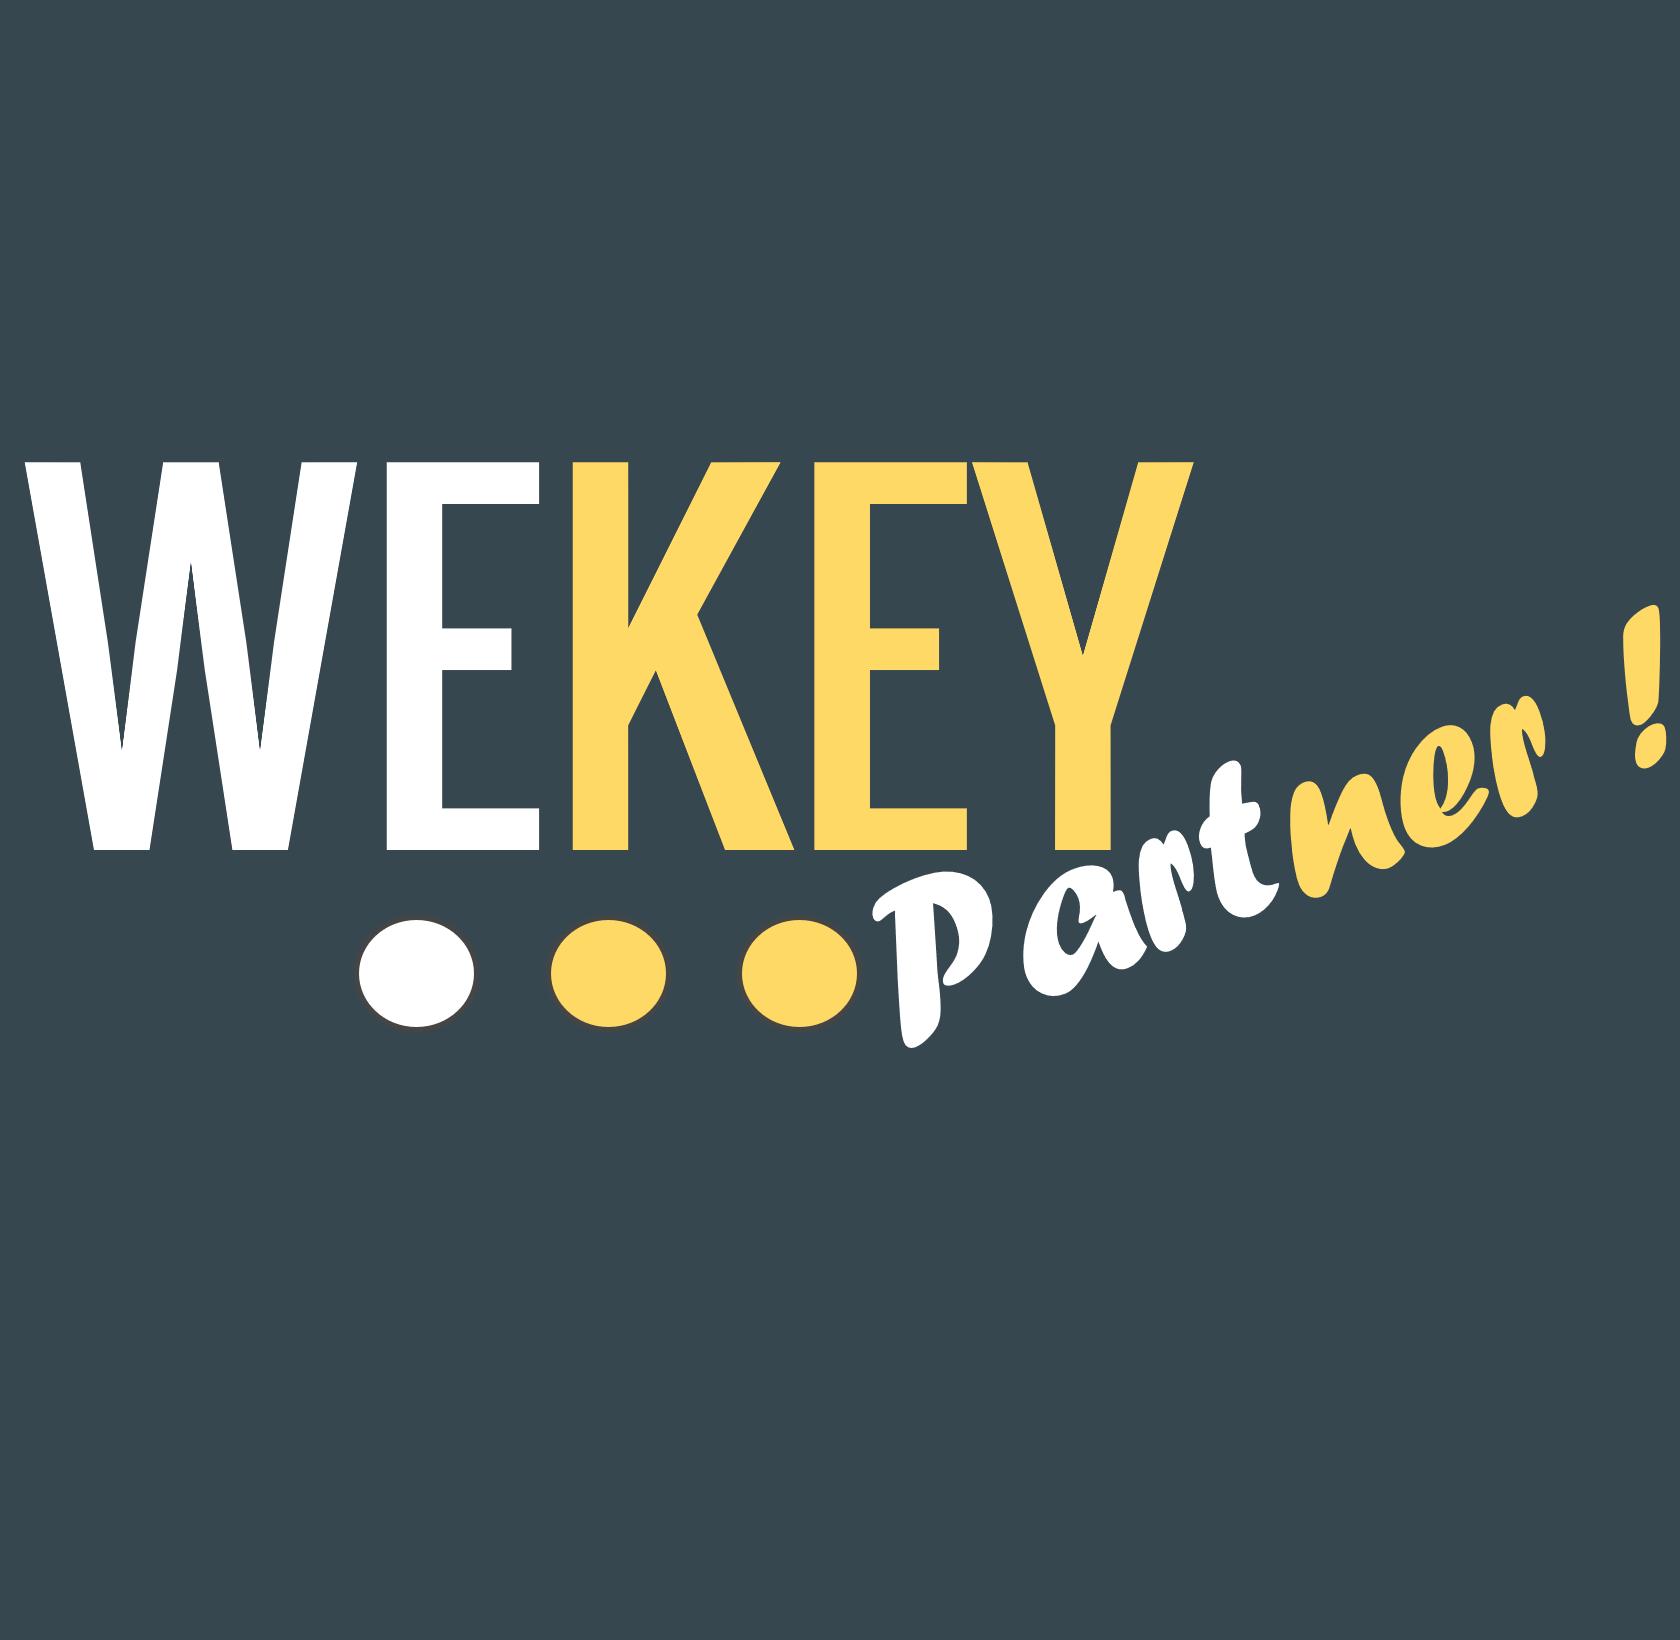 wekey-patner